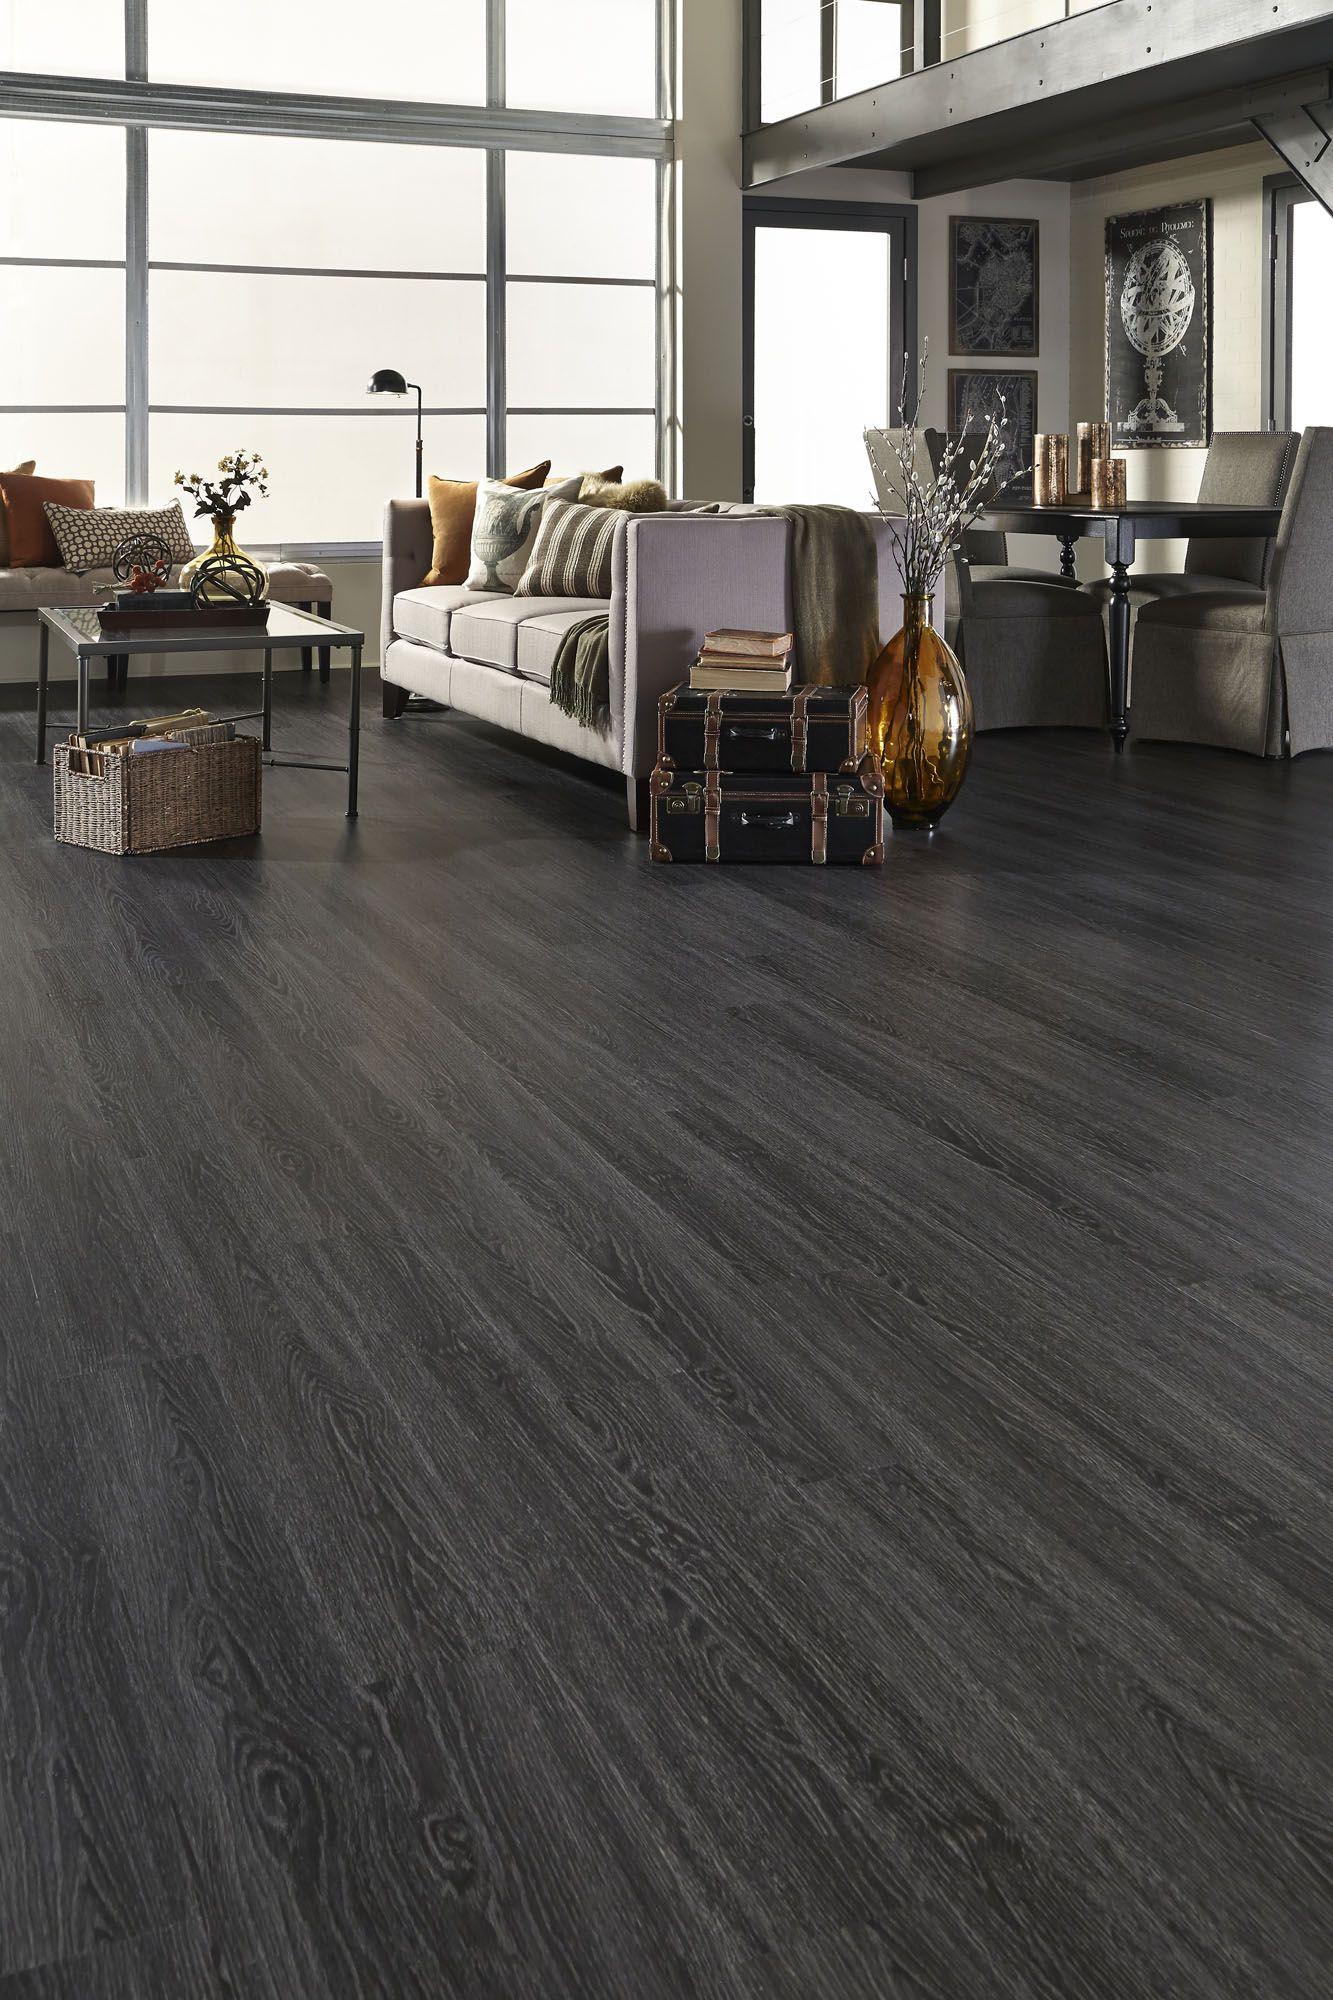 hardwood flooring distributors nj of flooring distributors the story of our herringbone flooring for flooring distributors coreluxe coal creek oak evp it s part of the worry proof collection